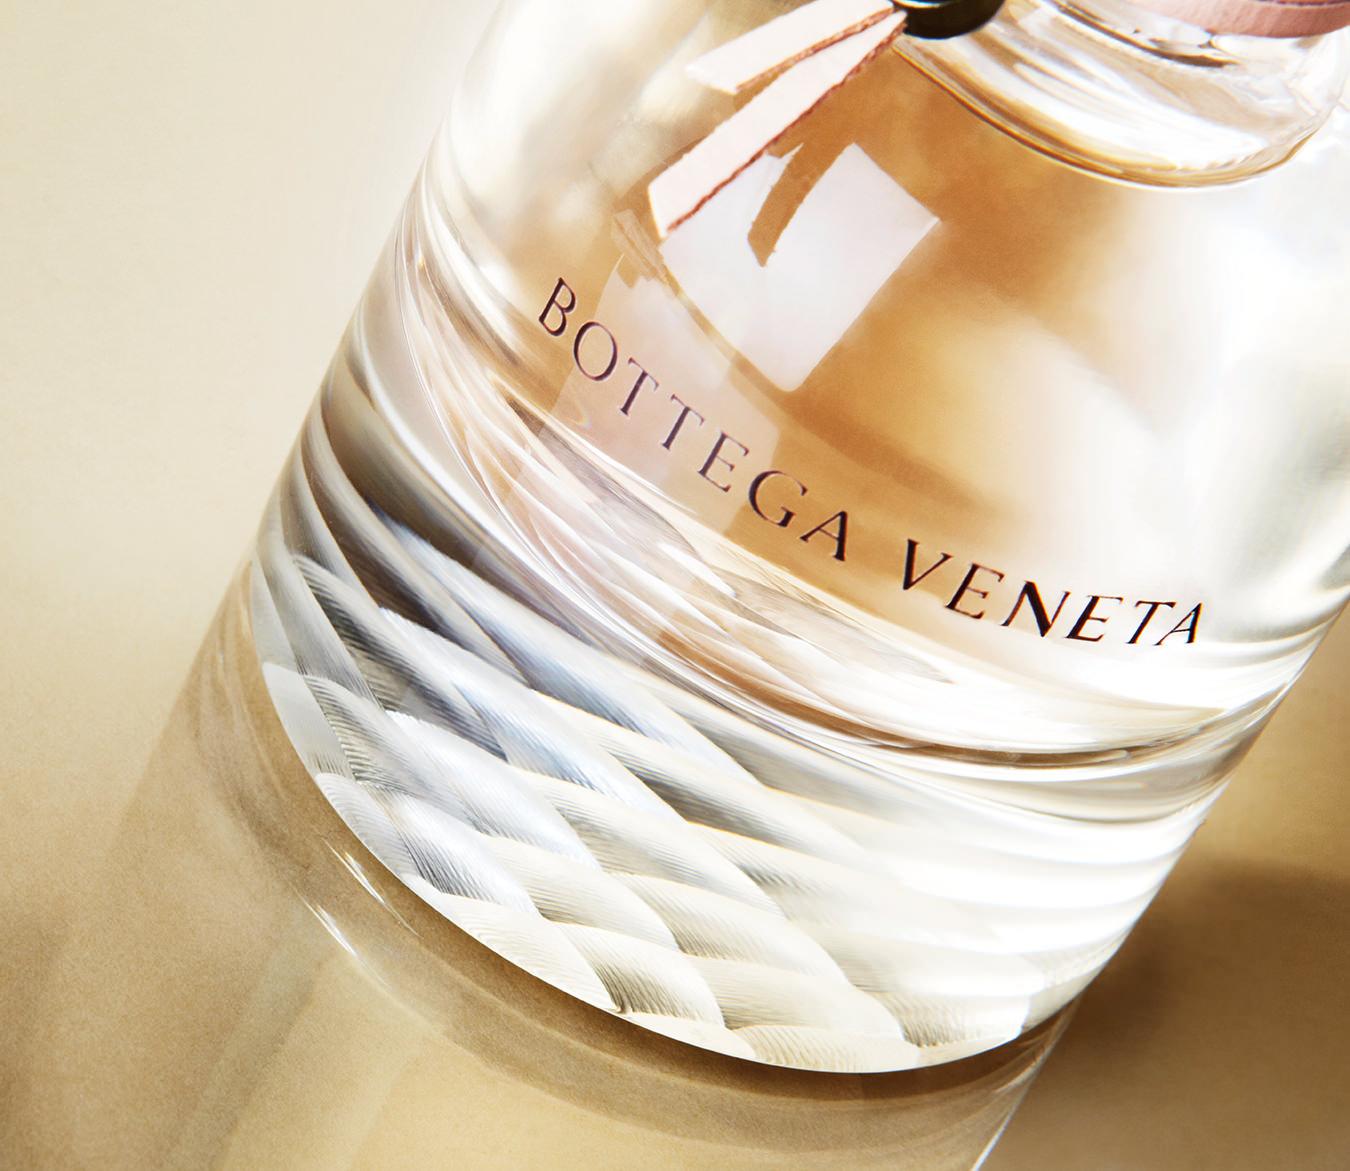 NUVO Magazine: Bottega Veneta